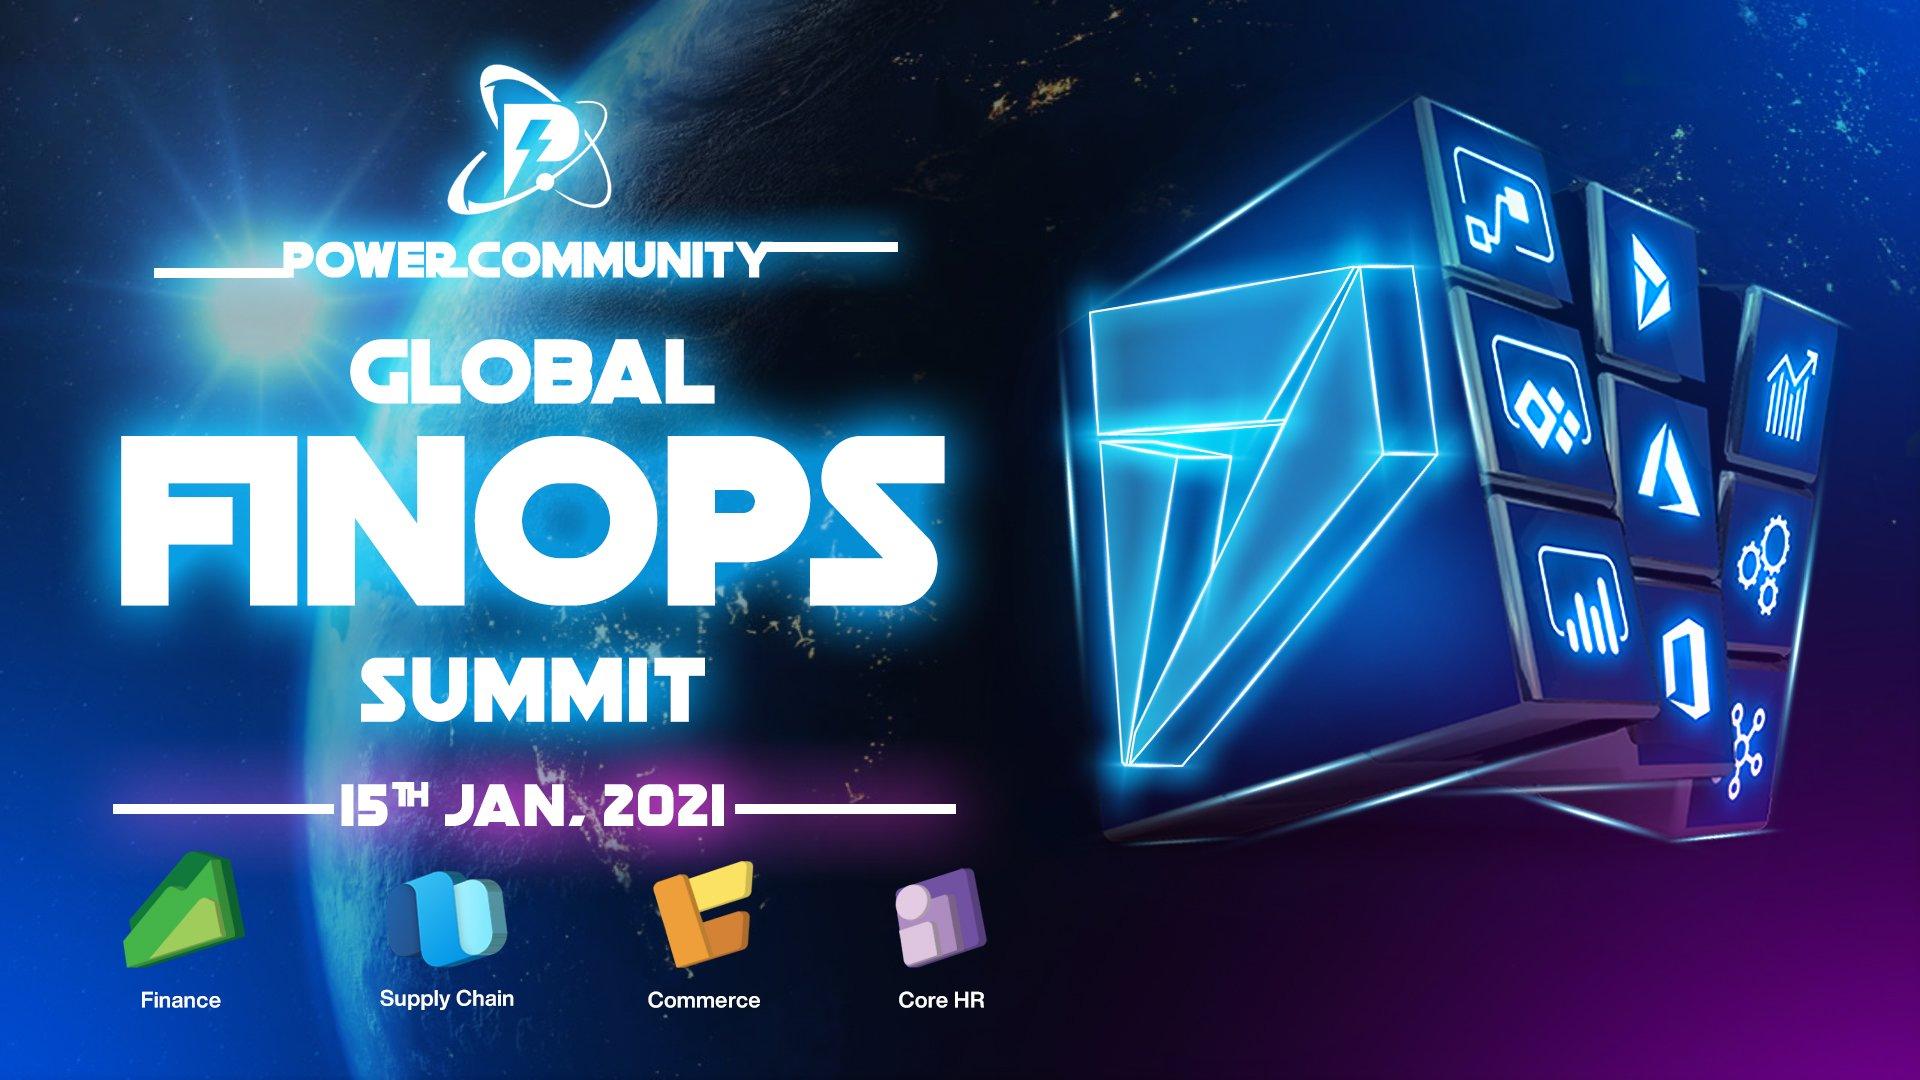 D365 Global FinOps Summit